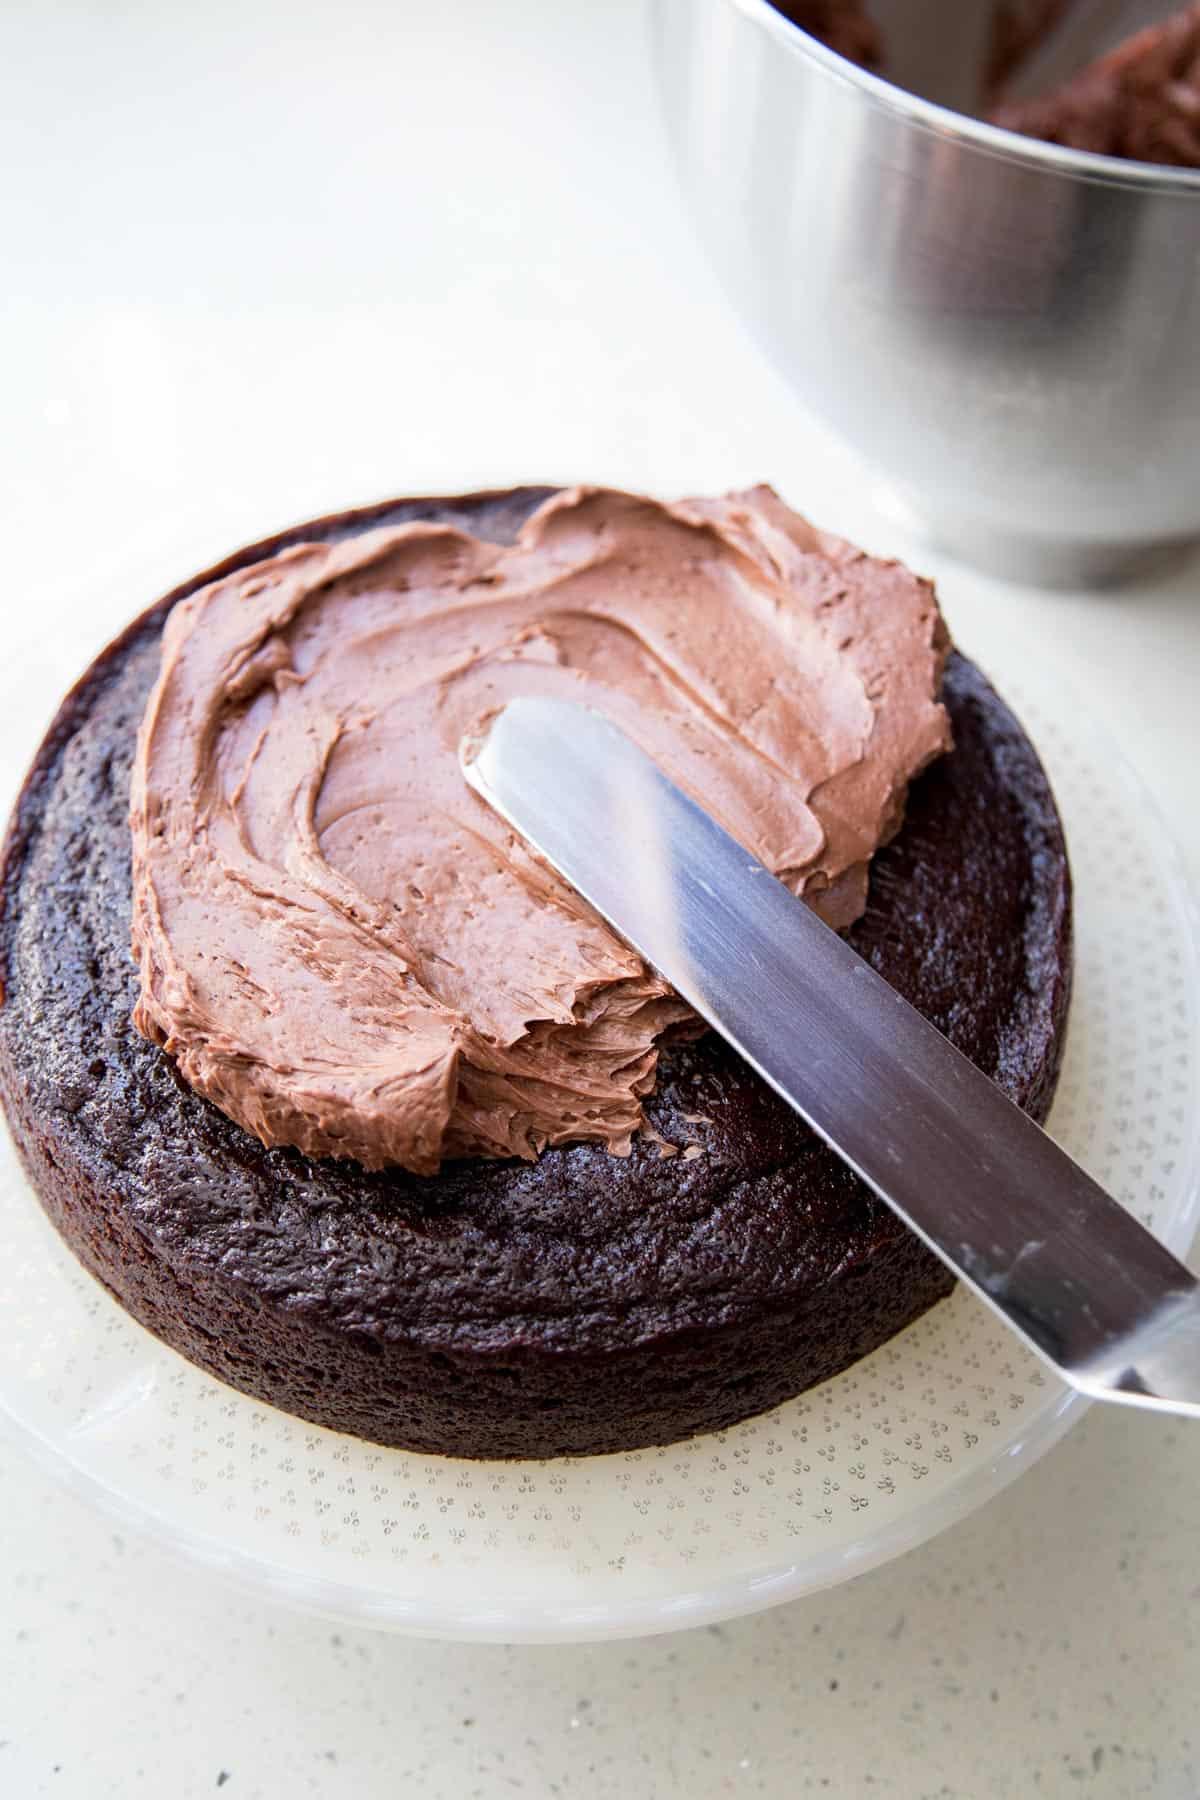 Adding chocolate buttercream on chocolate cake